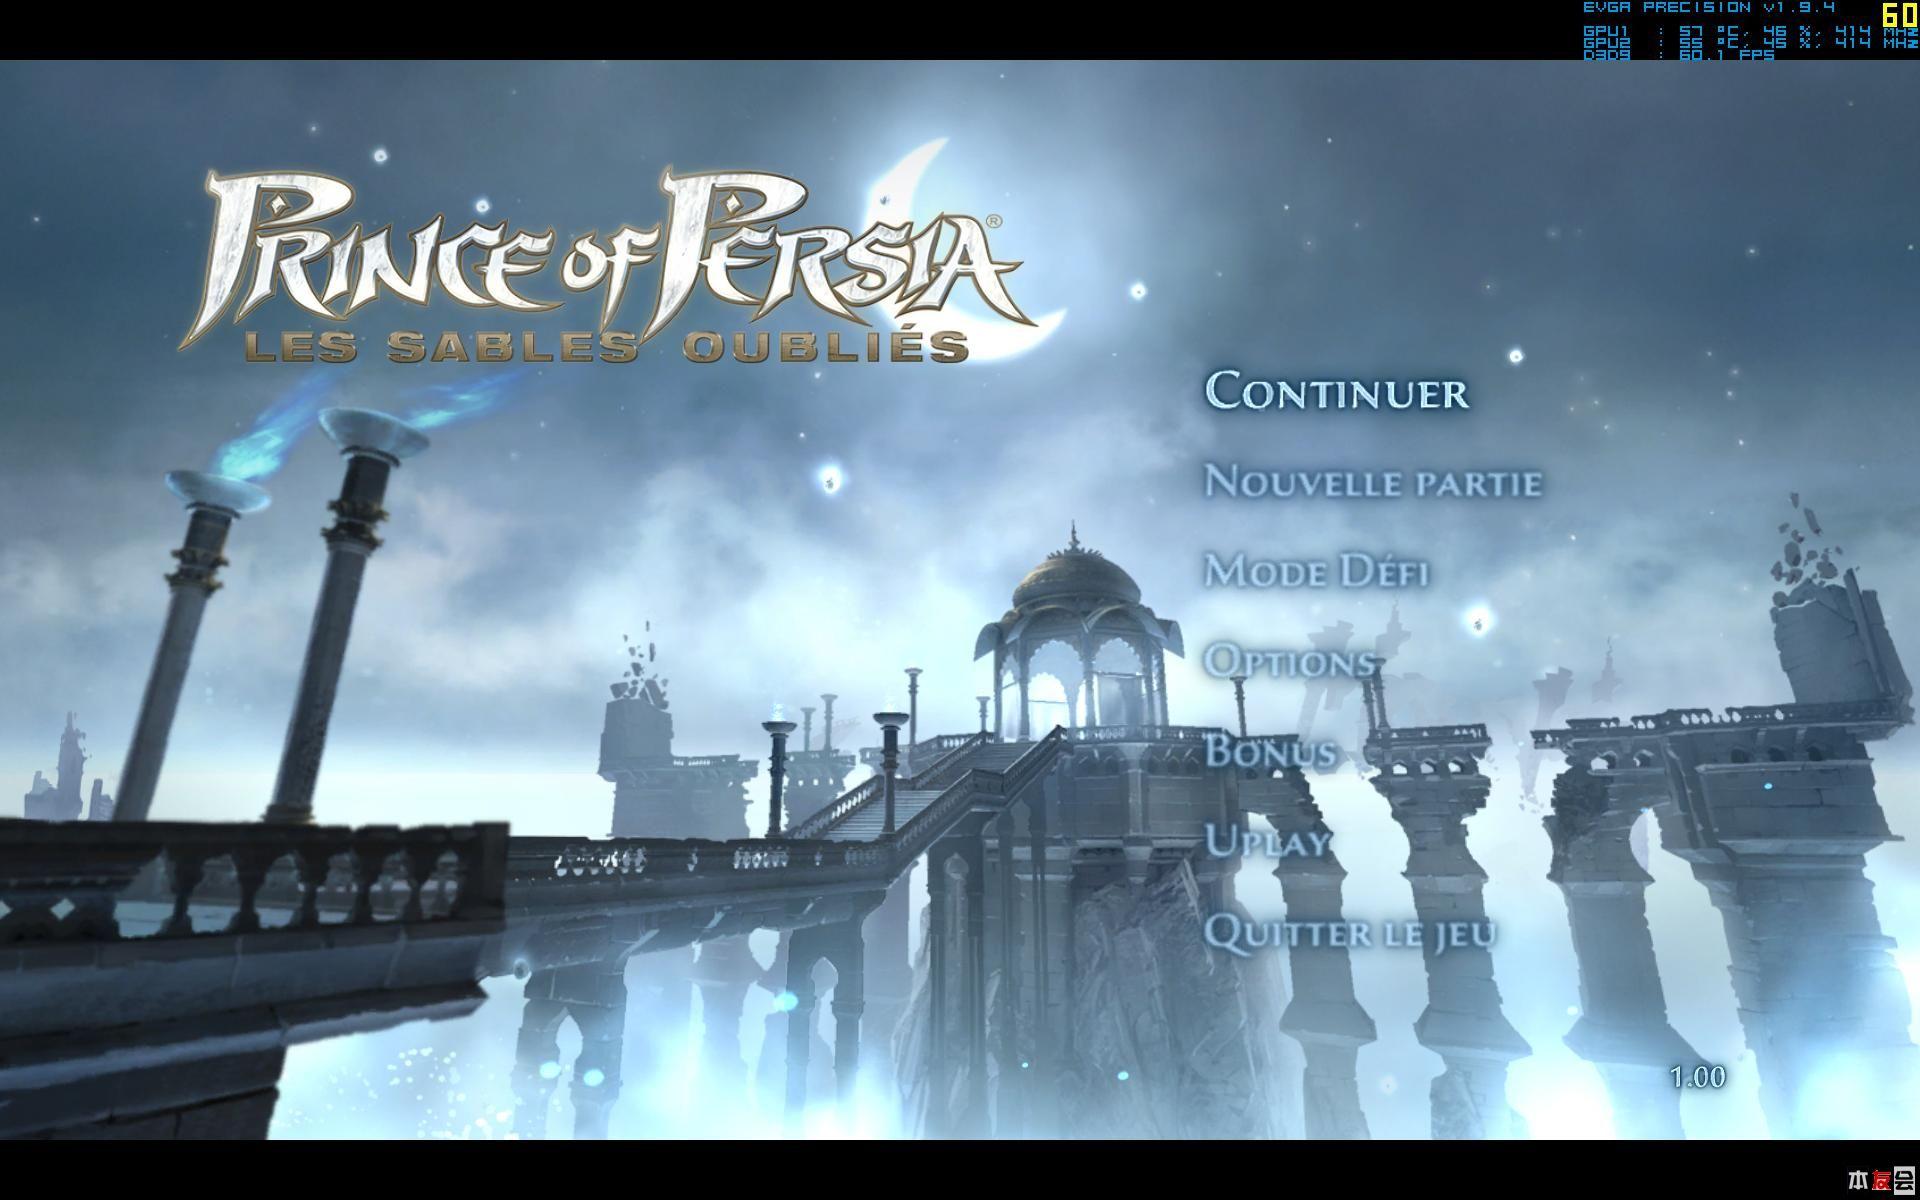 Prince of Persia 2010-07-02 10-57-25-09.jpg